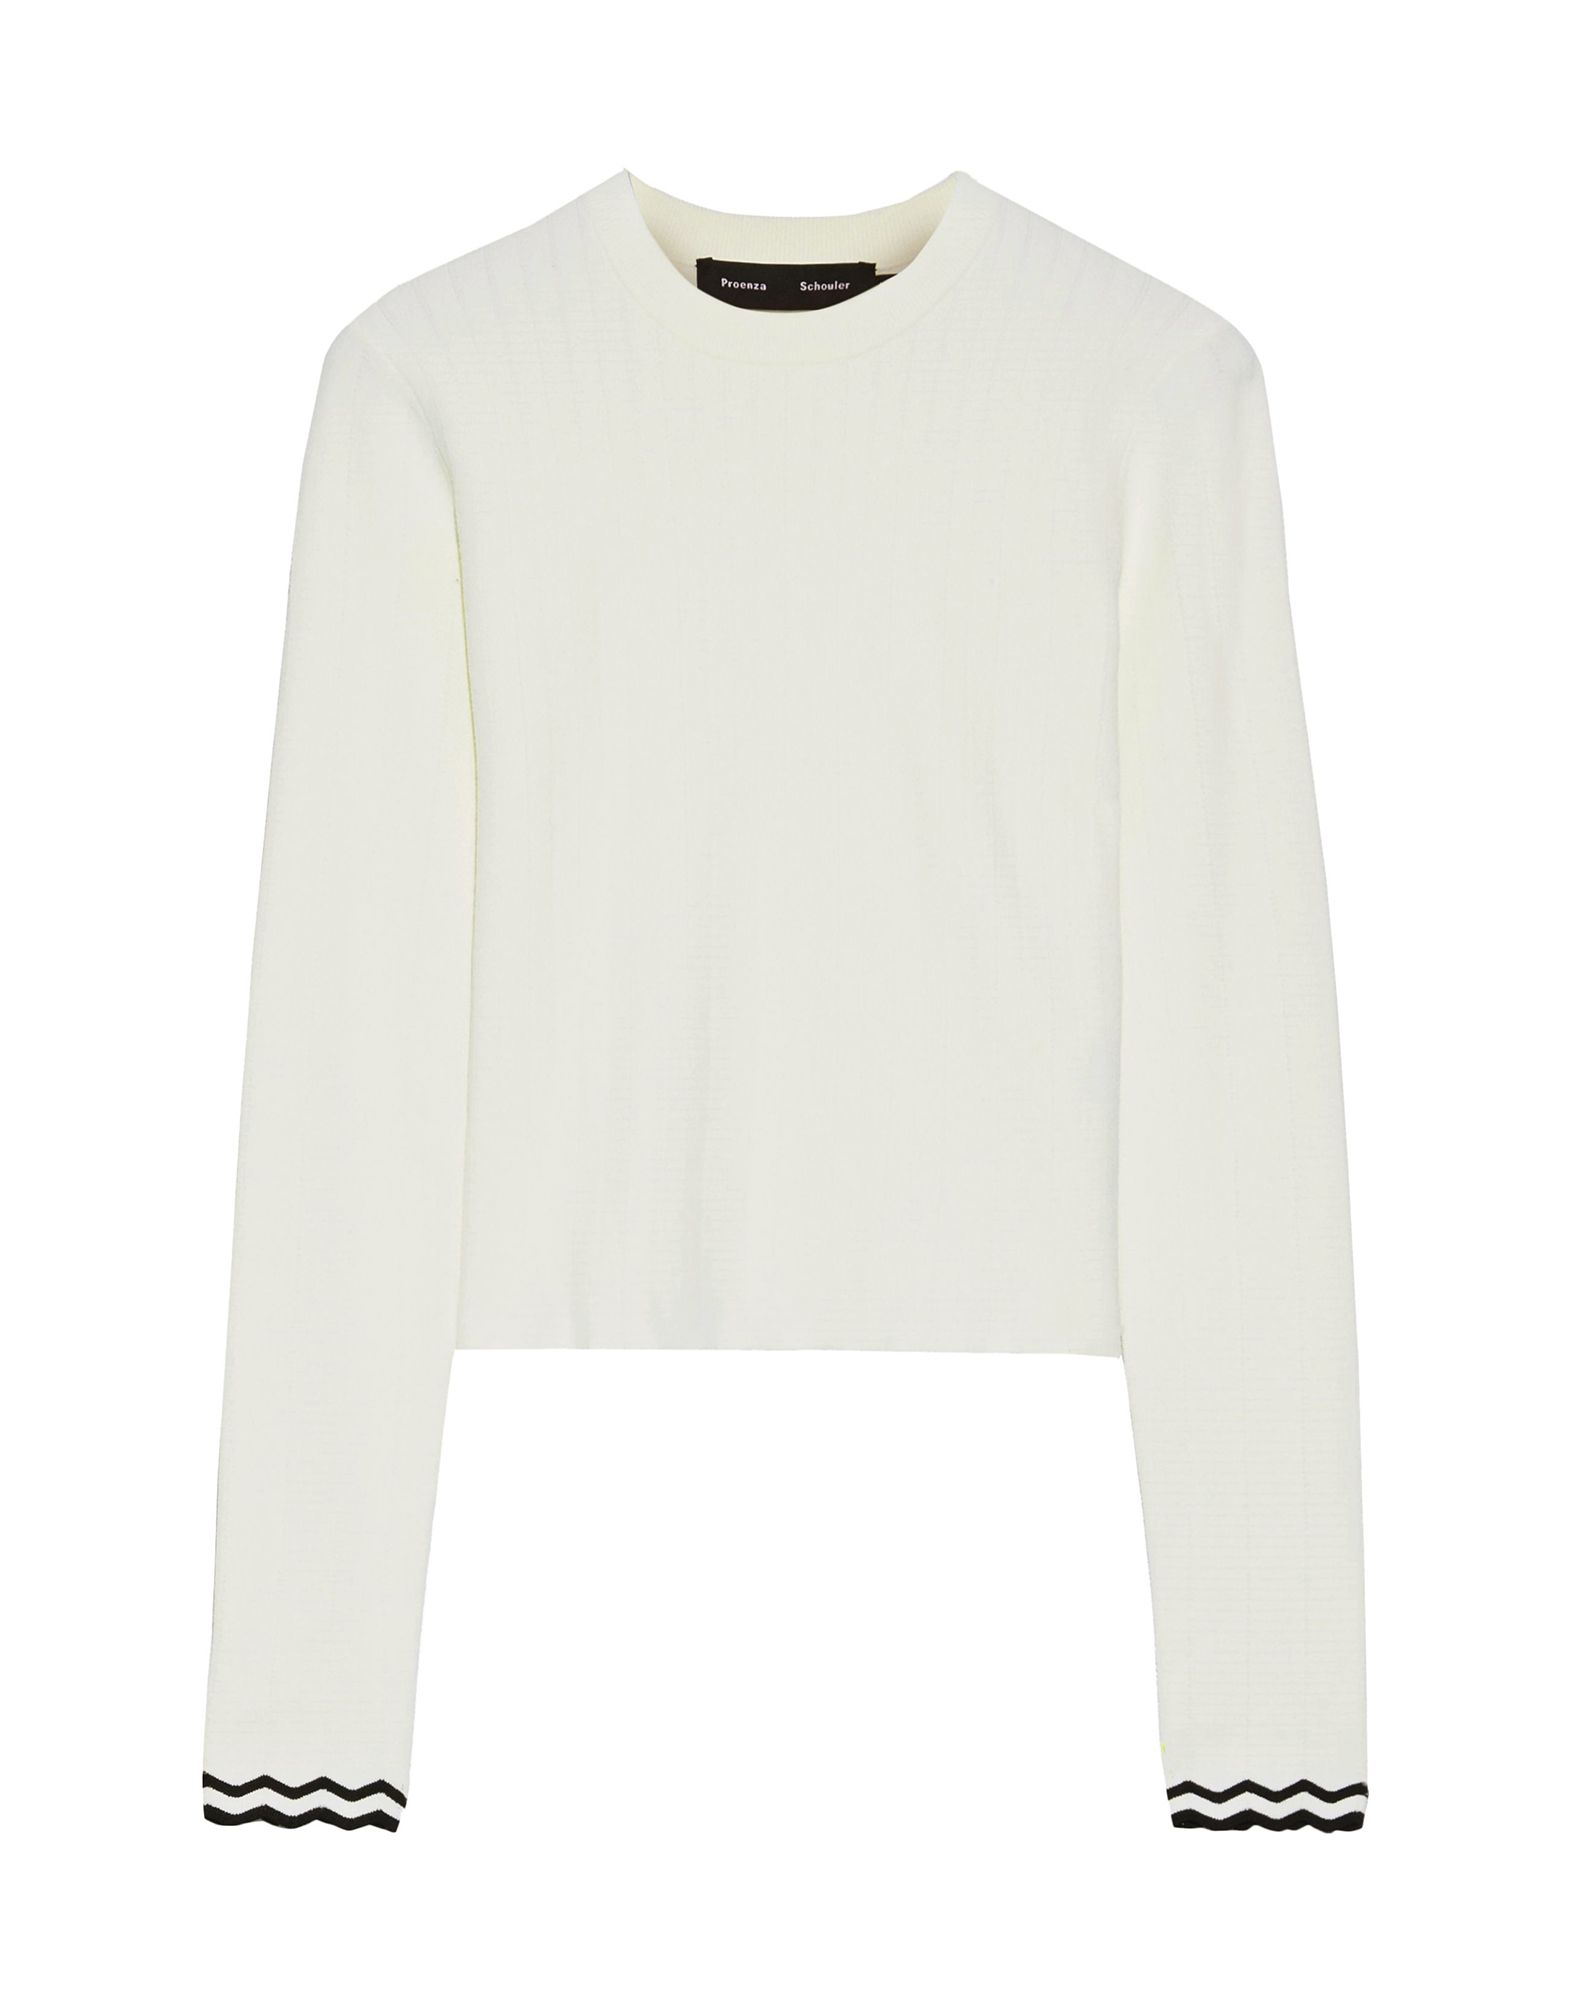 PROENZA SCHOULER Sweaters - Item 14081119